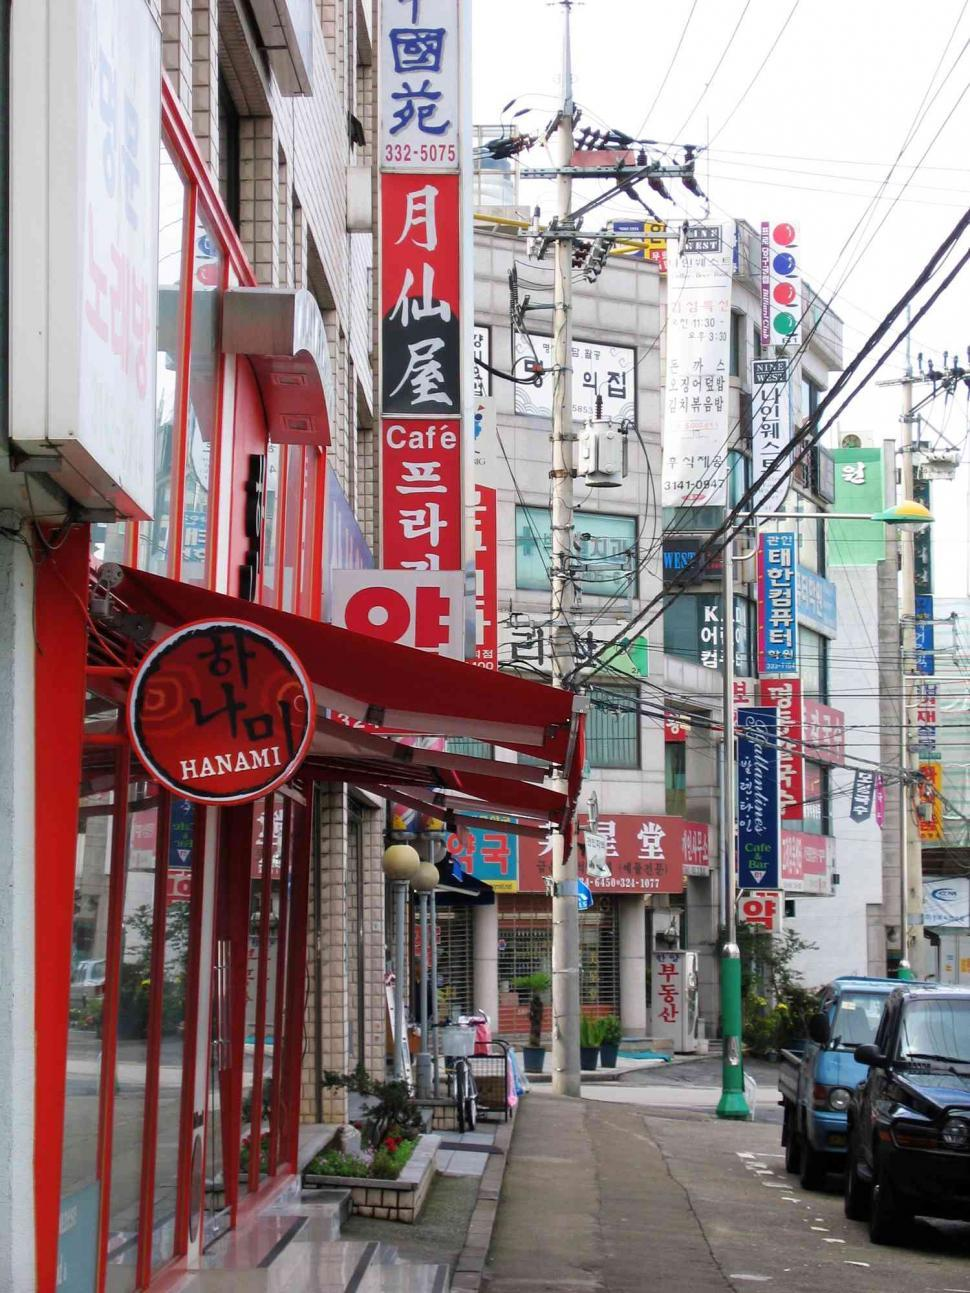 Download Free Stock Photo of On the sidewalk of Korea